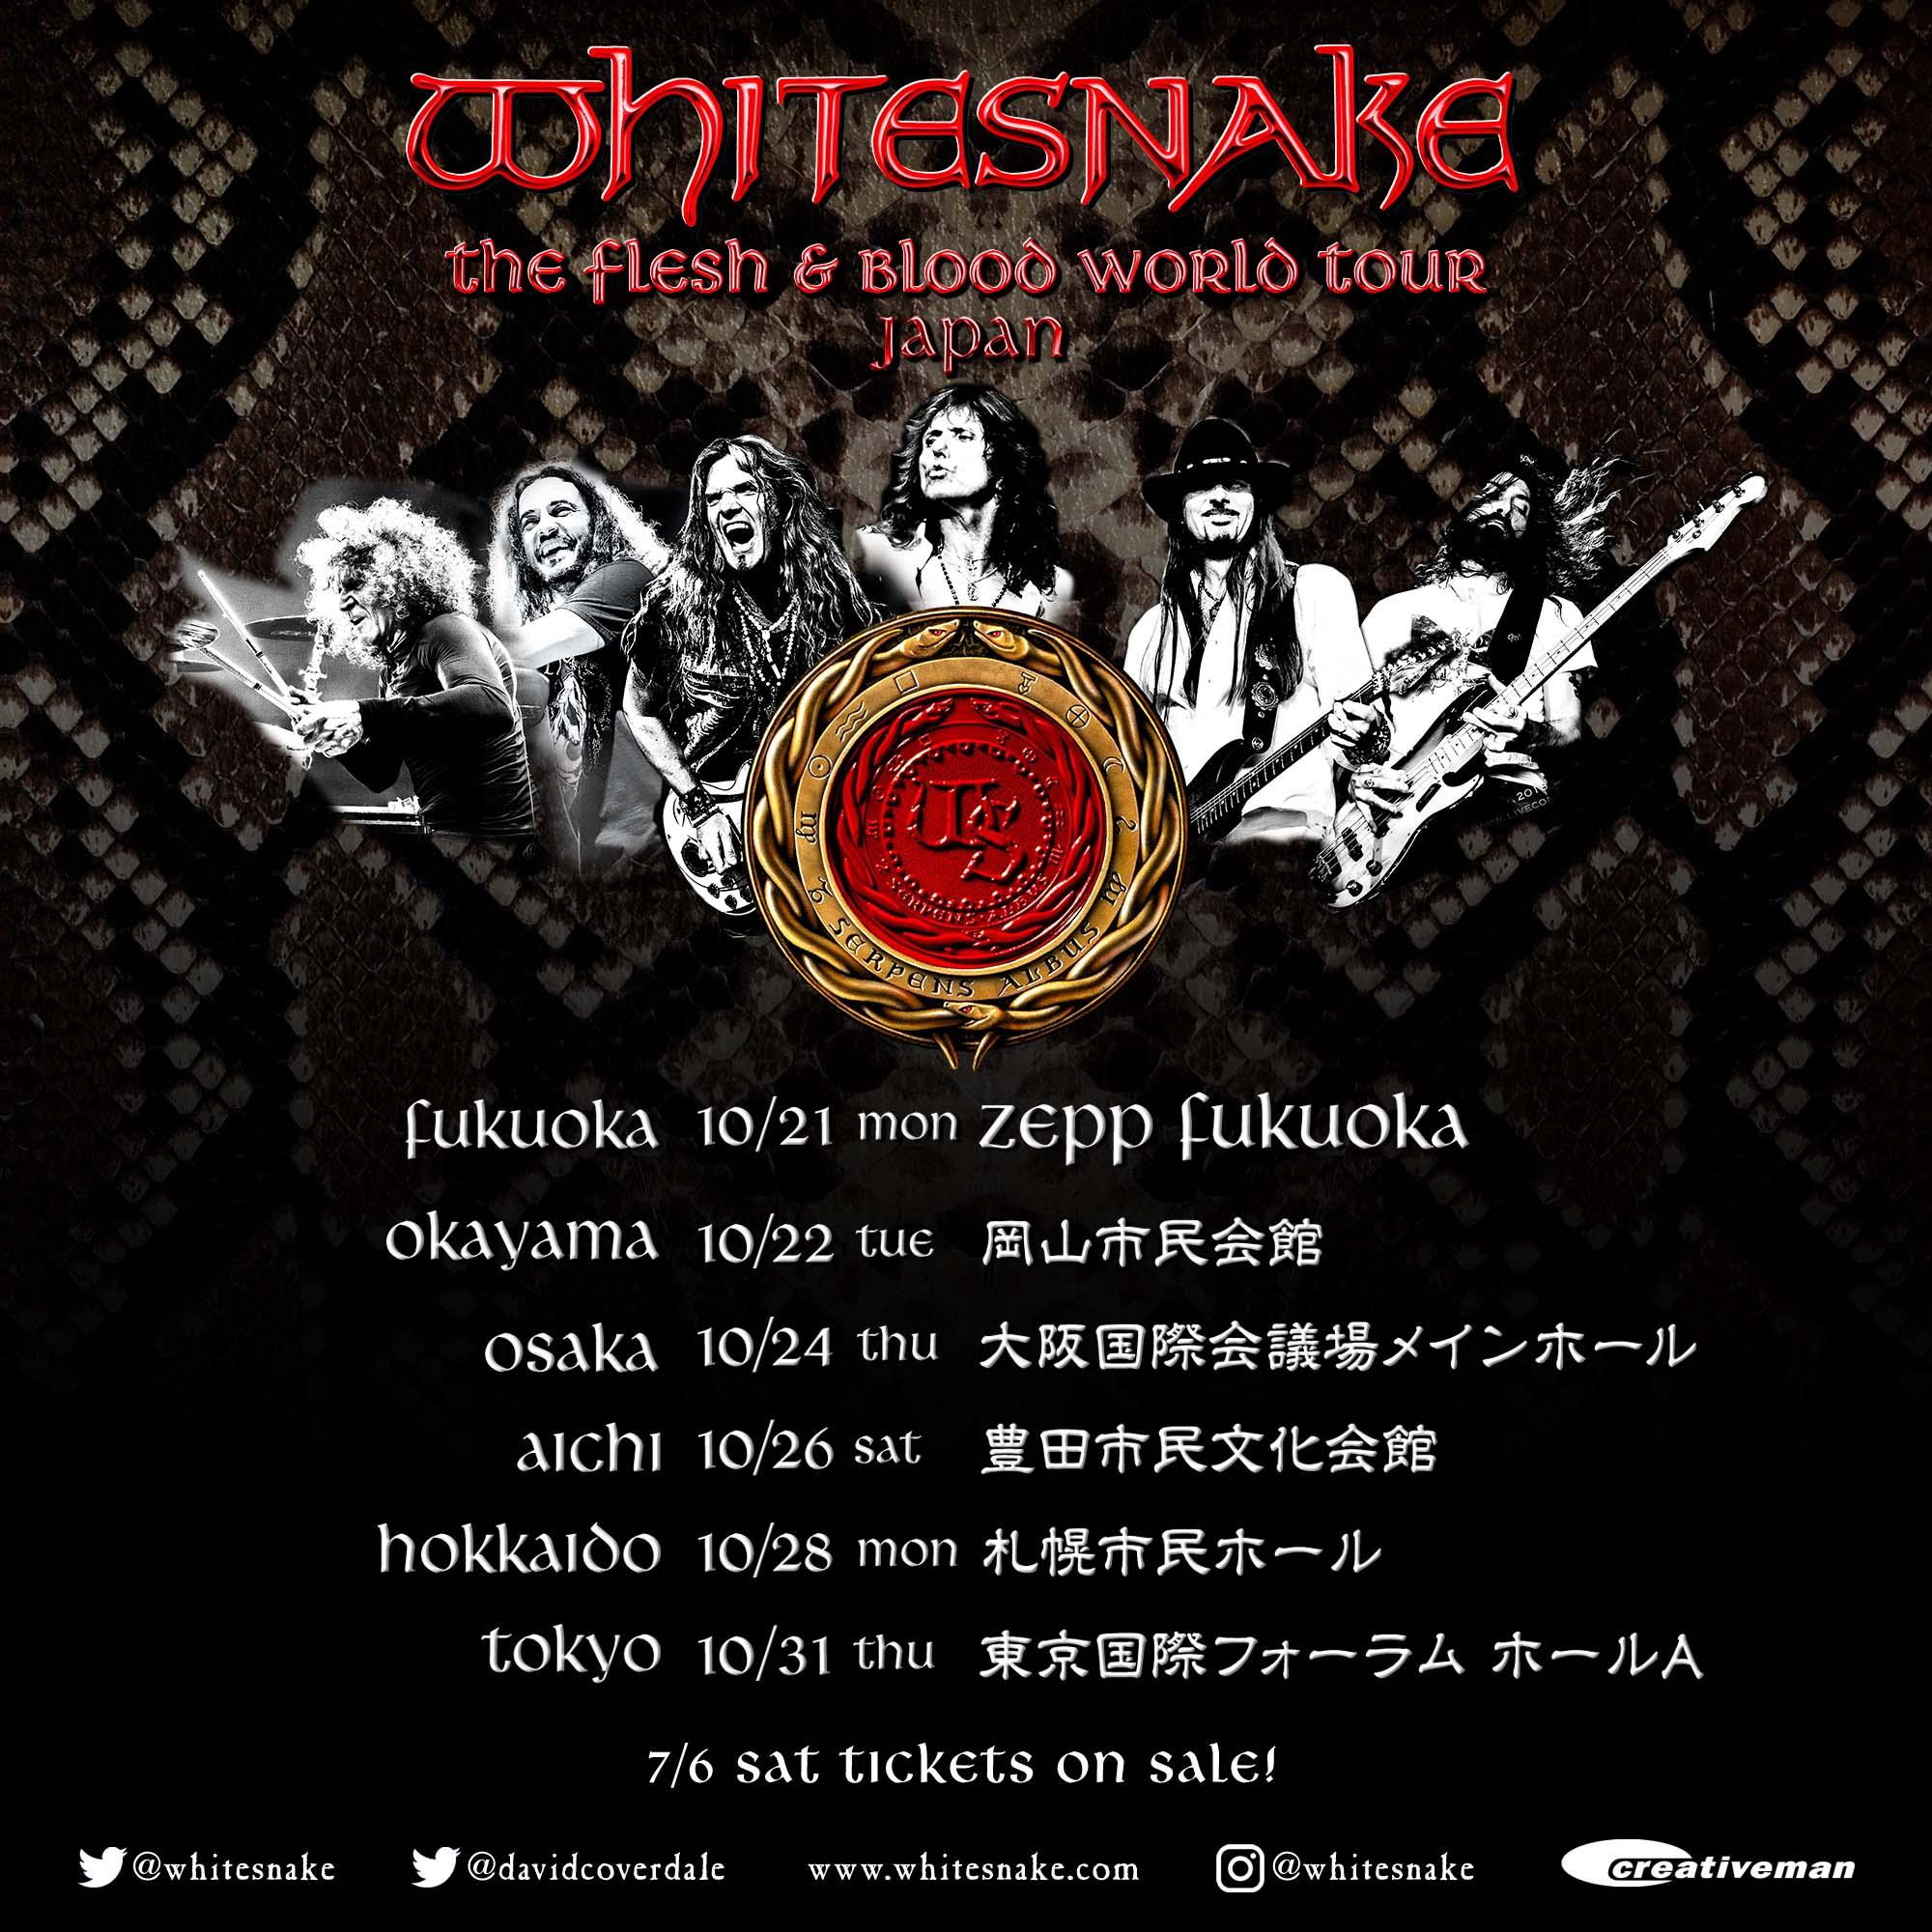 WHITESNAKE The Flesh & Blood World Tour Japan 2019